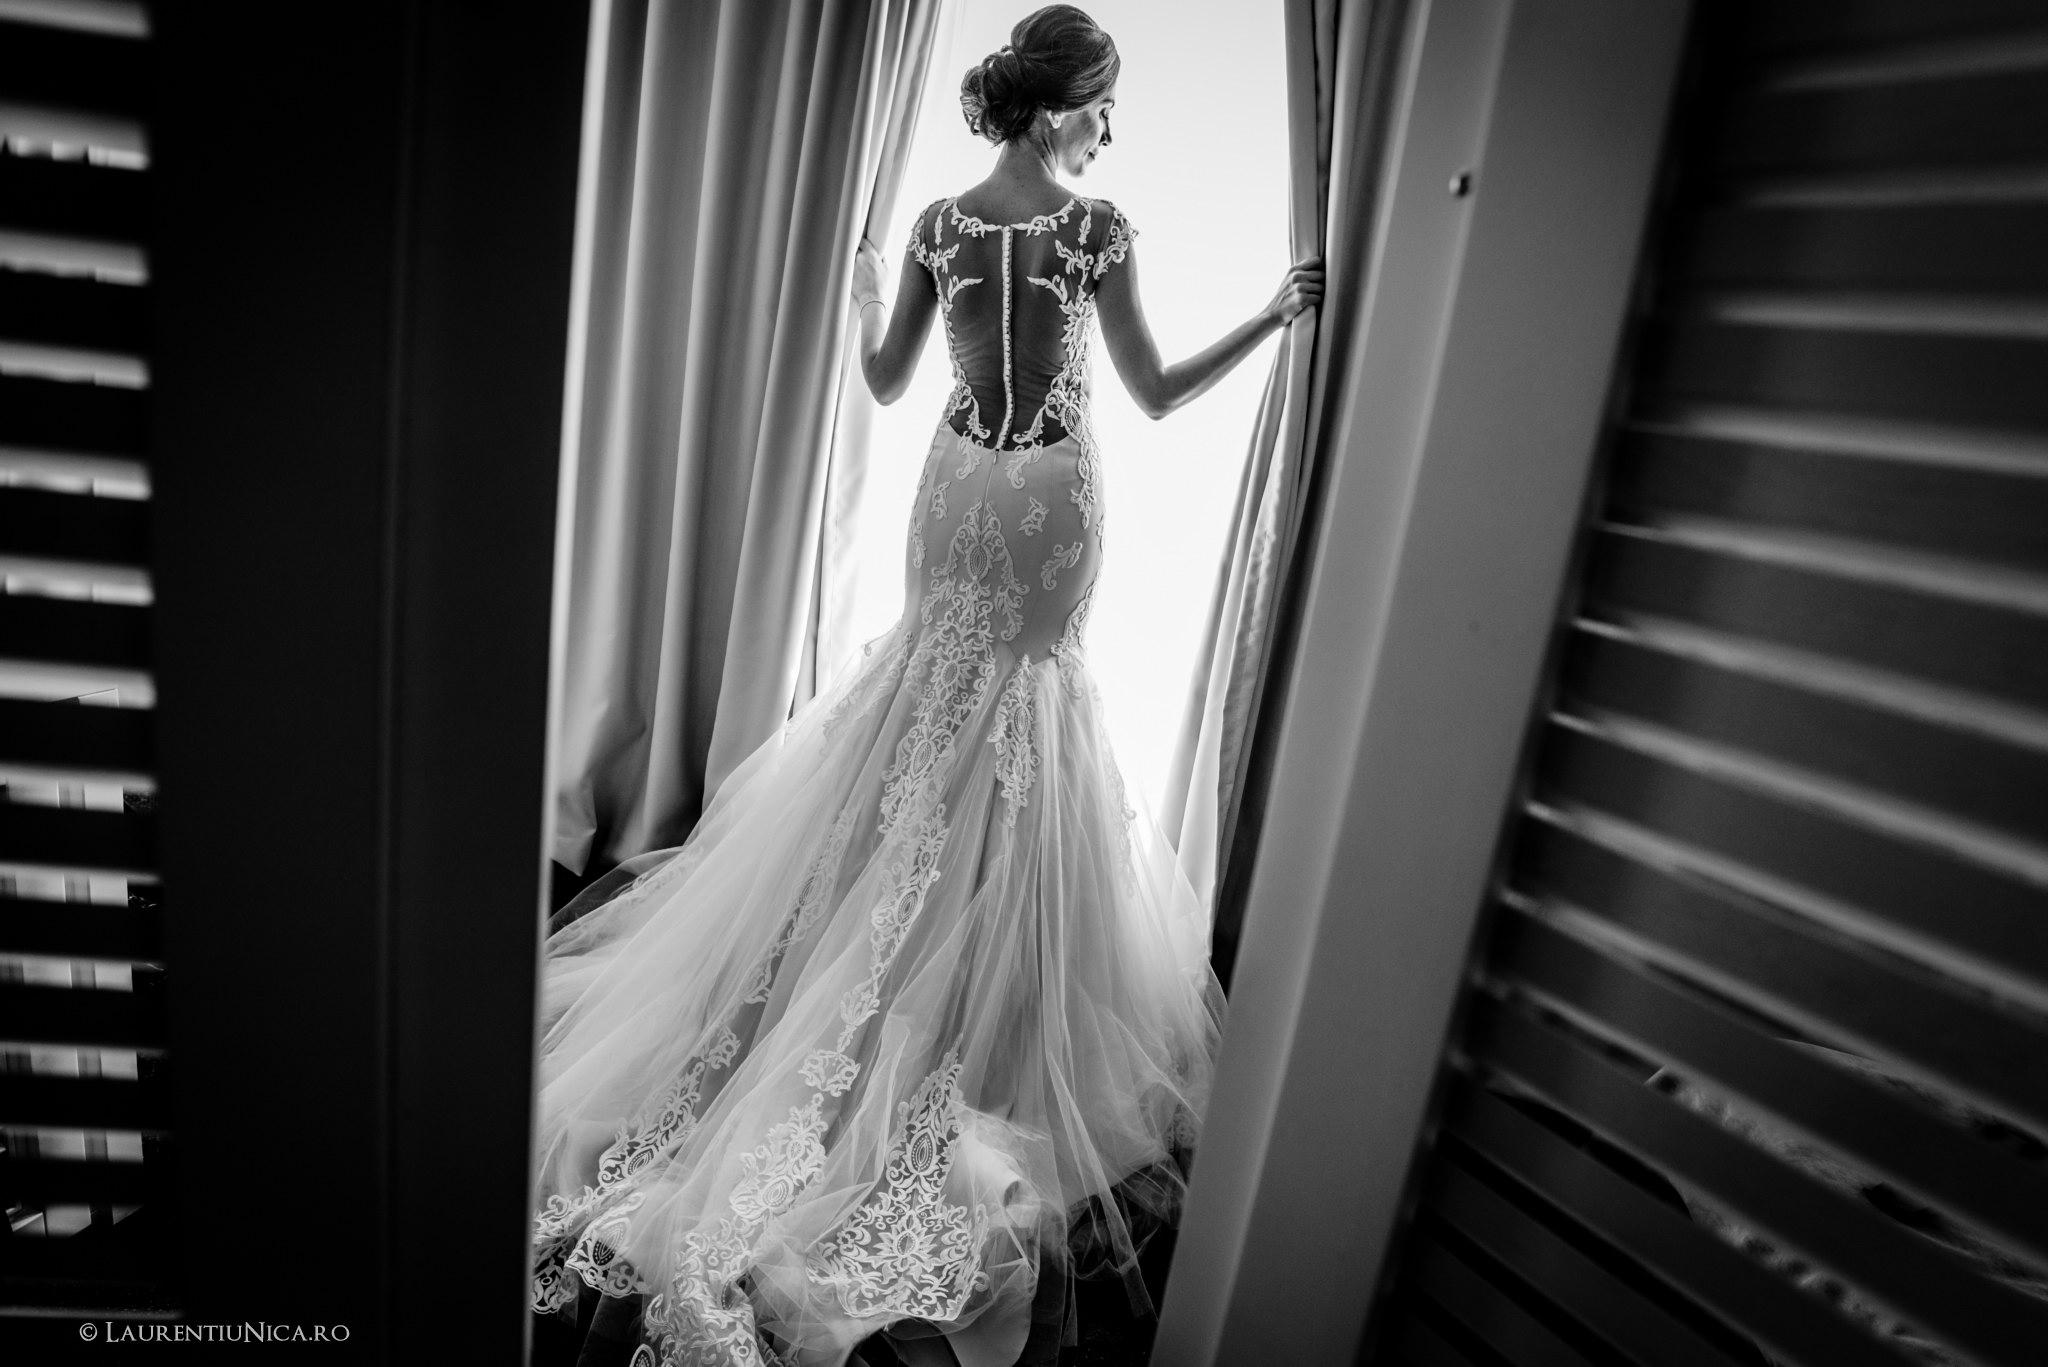 andreea si alin fotografii after wedding balchik bulgaria01 - Andreea & Alin | Fotografii After Wedding | Balchik Bulgaria